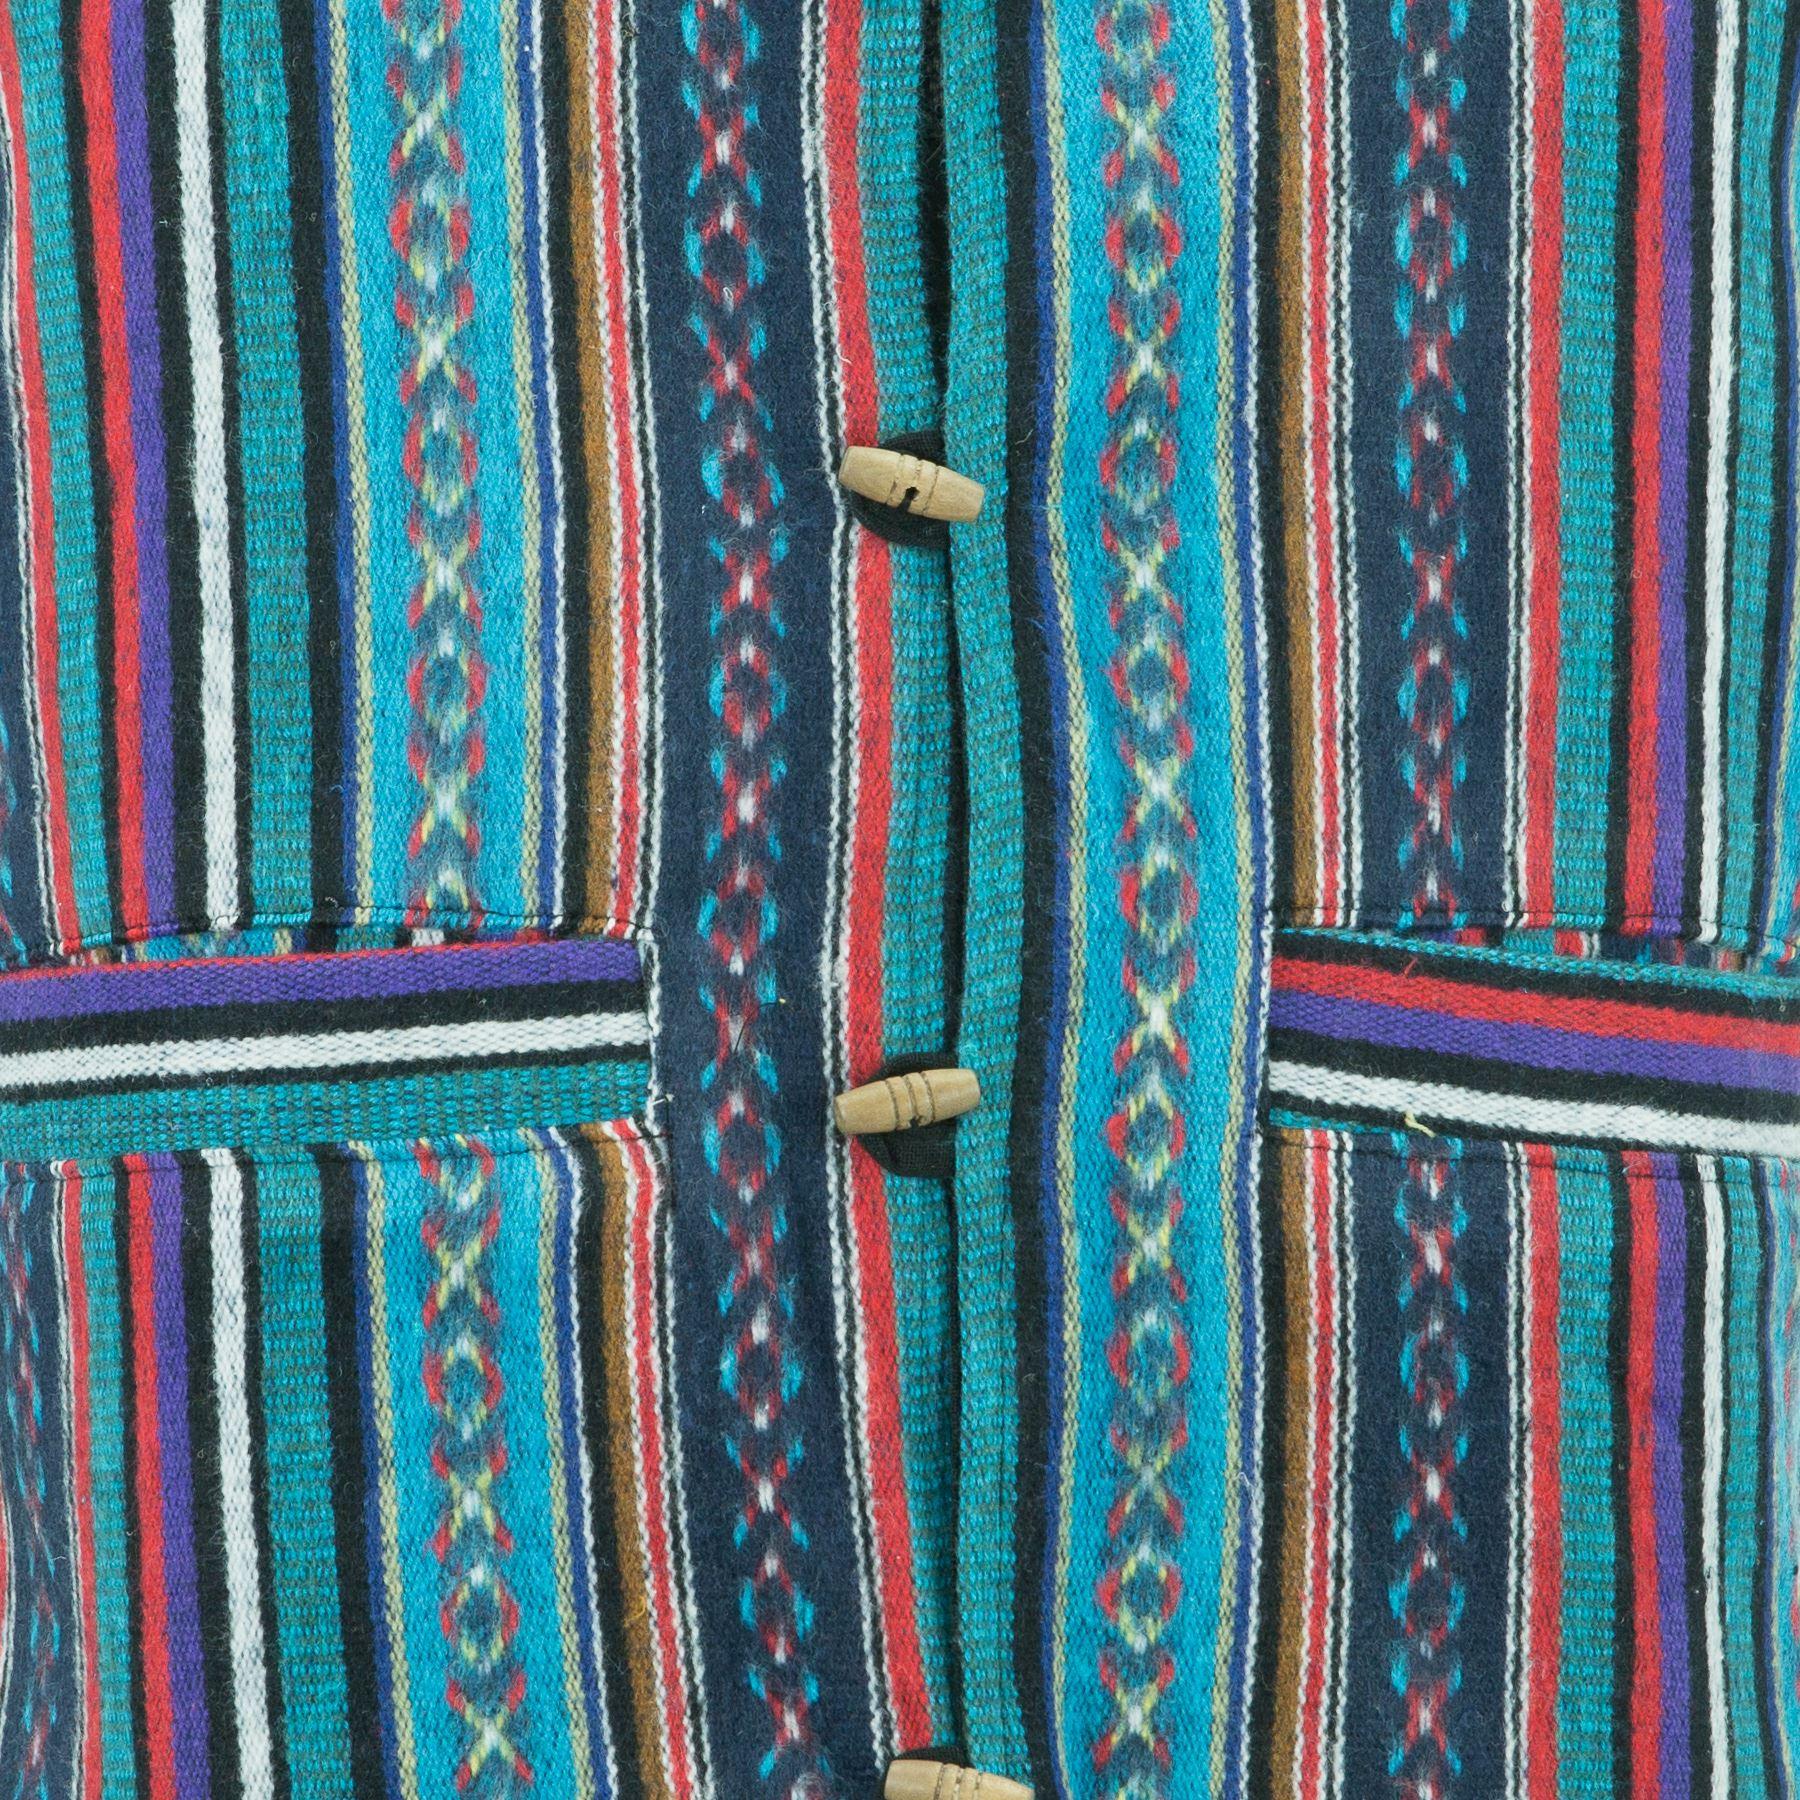 Chaleco-Algodon-Hombre-Perchado-Hippie-Boho-Traje-para-Hombre-Mujer miniatura 14